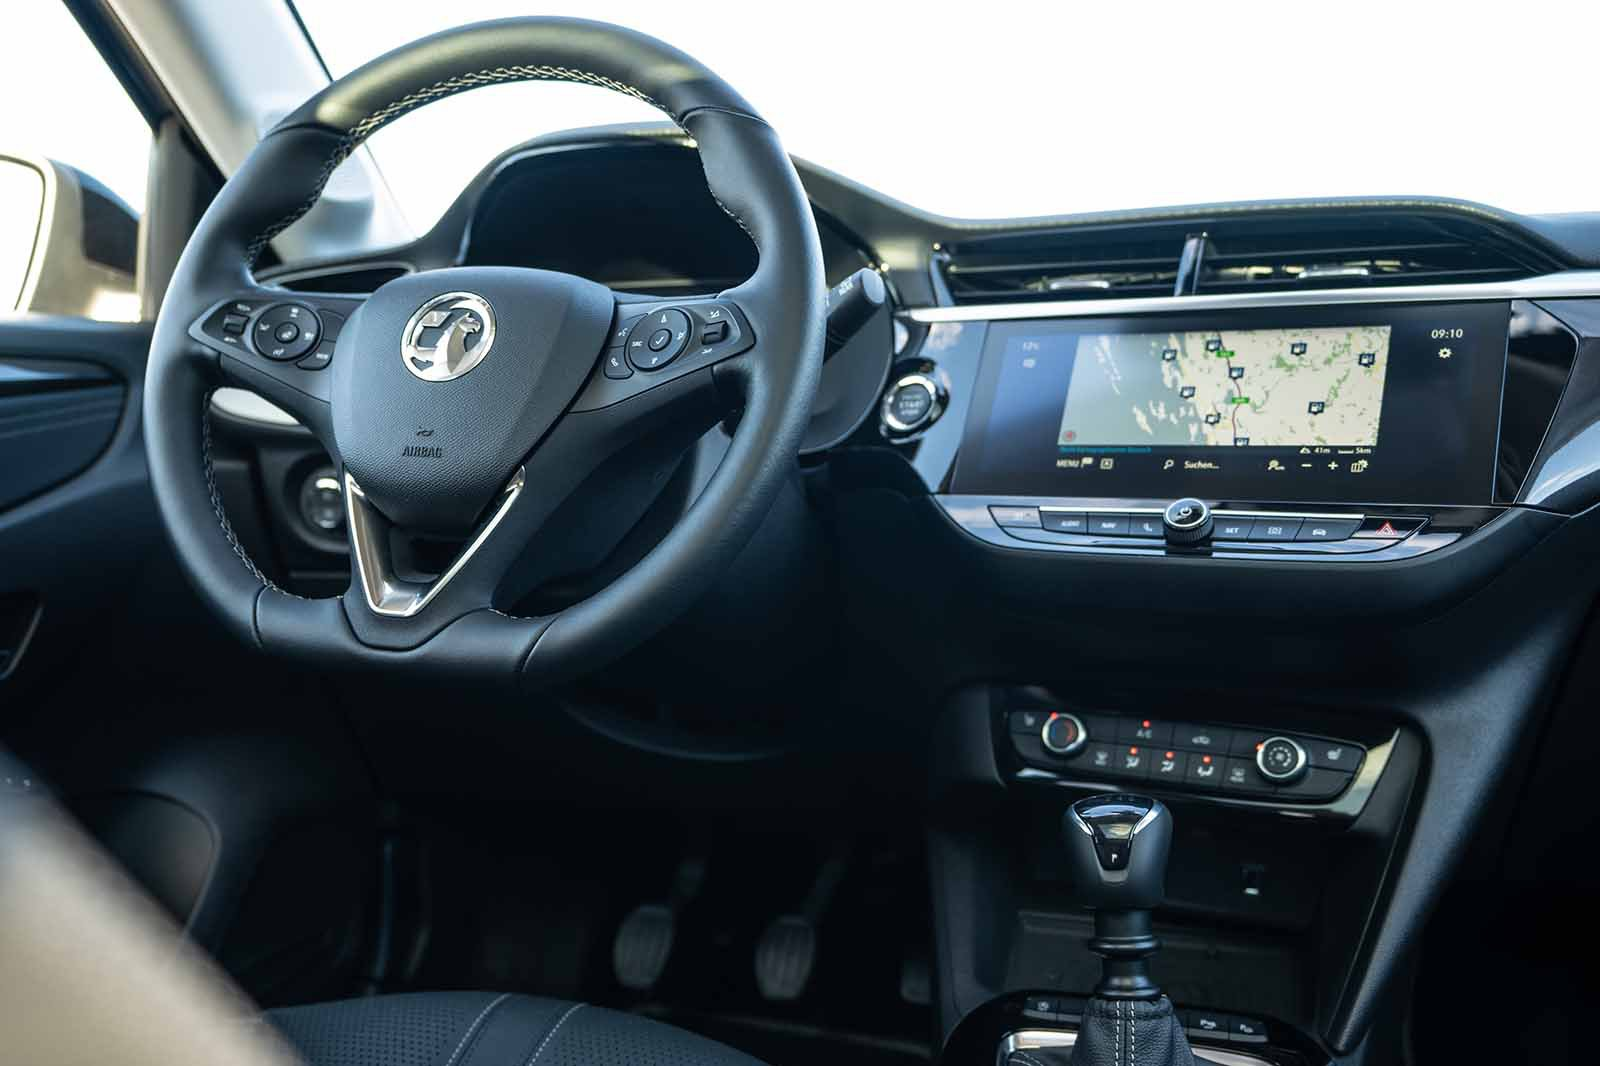 Vauxhall Corsa 2019 LHD dashboard